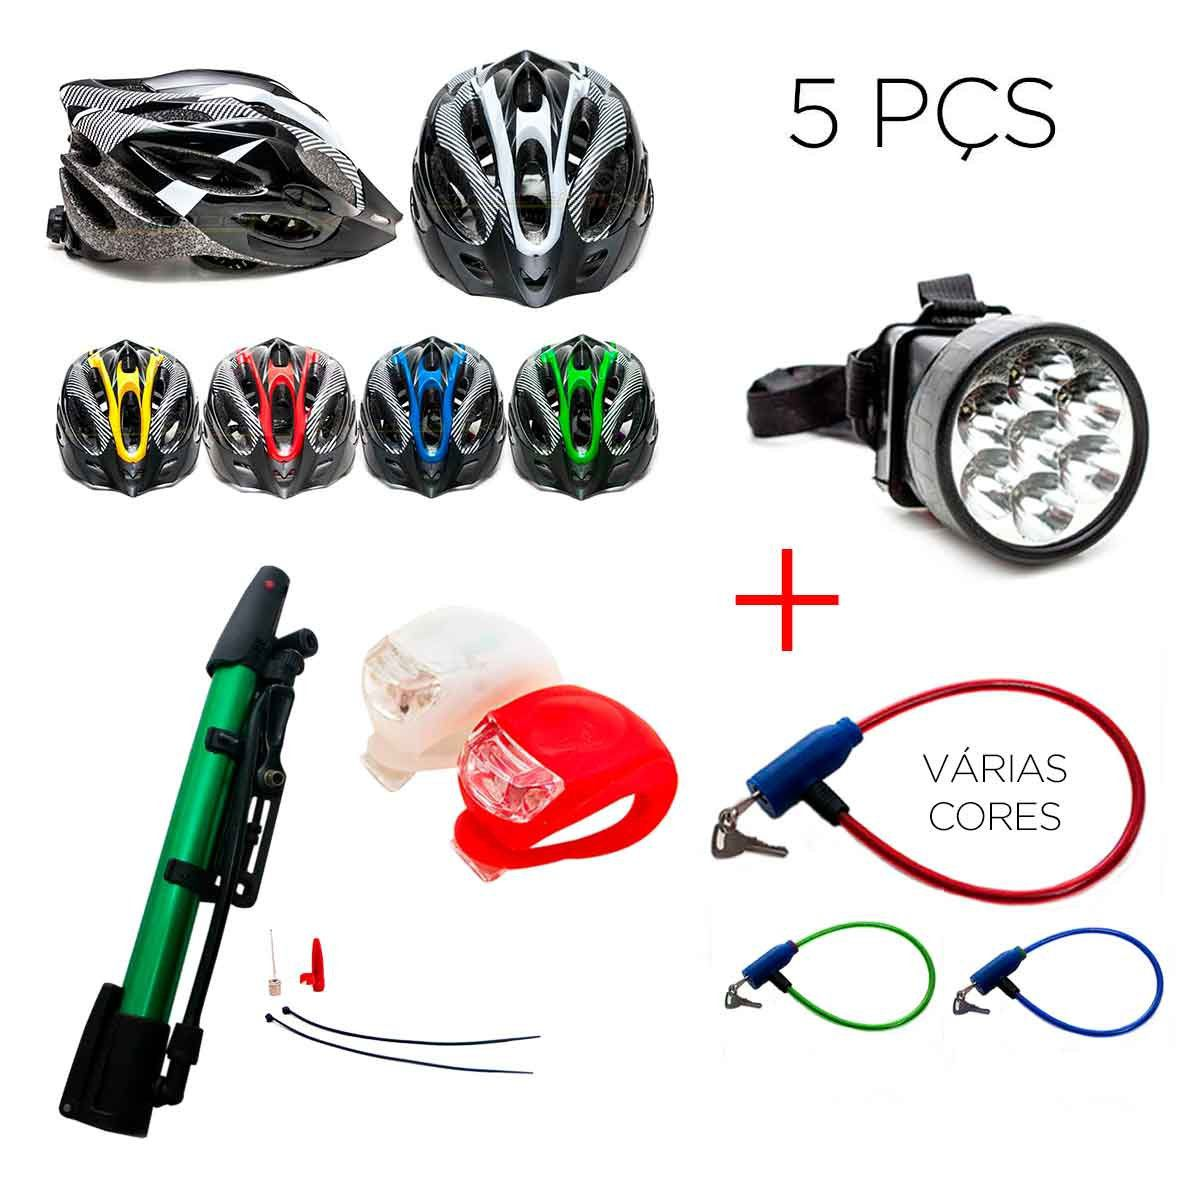 Kit Ciclismo Capacete Ciclista Bike+lant+farol+cadeado+bomba